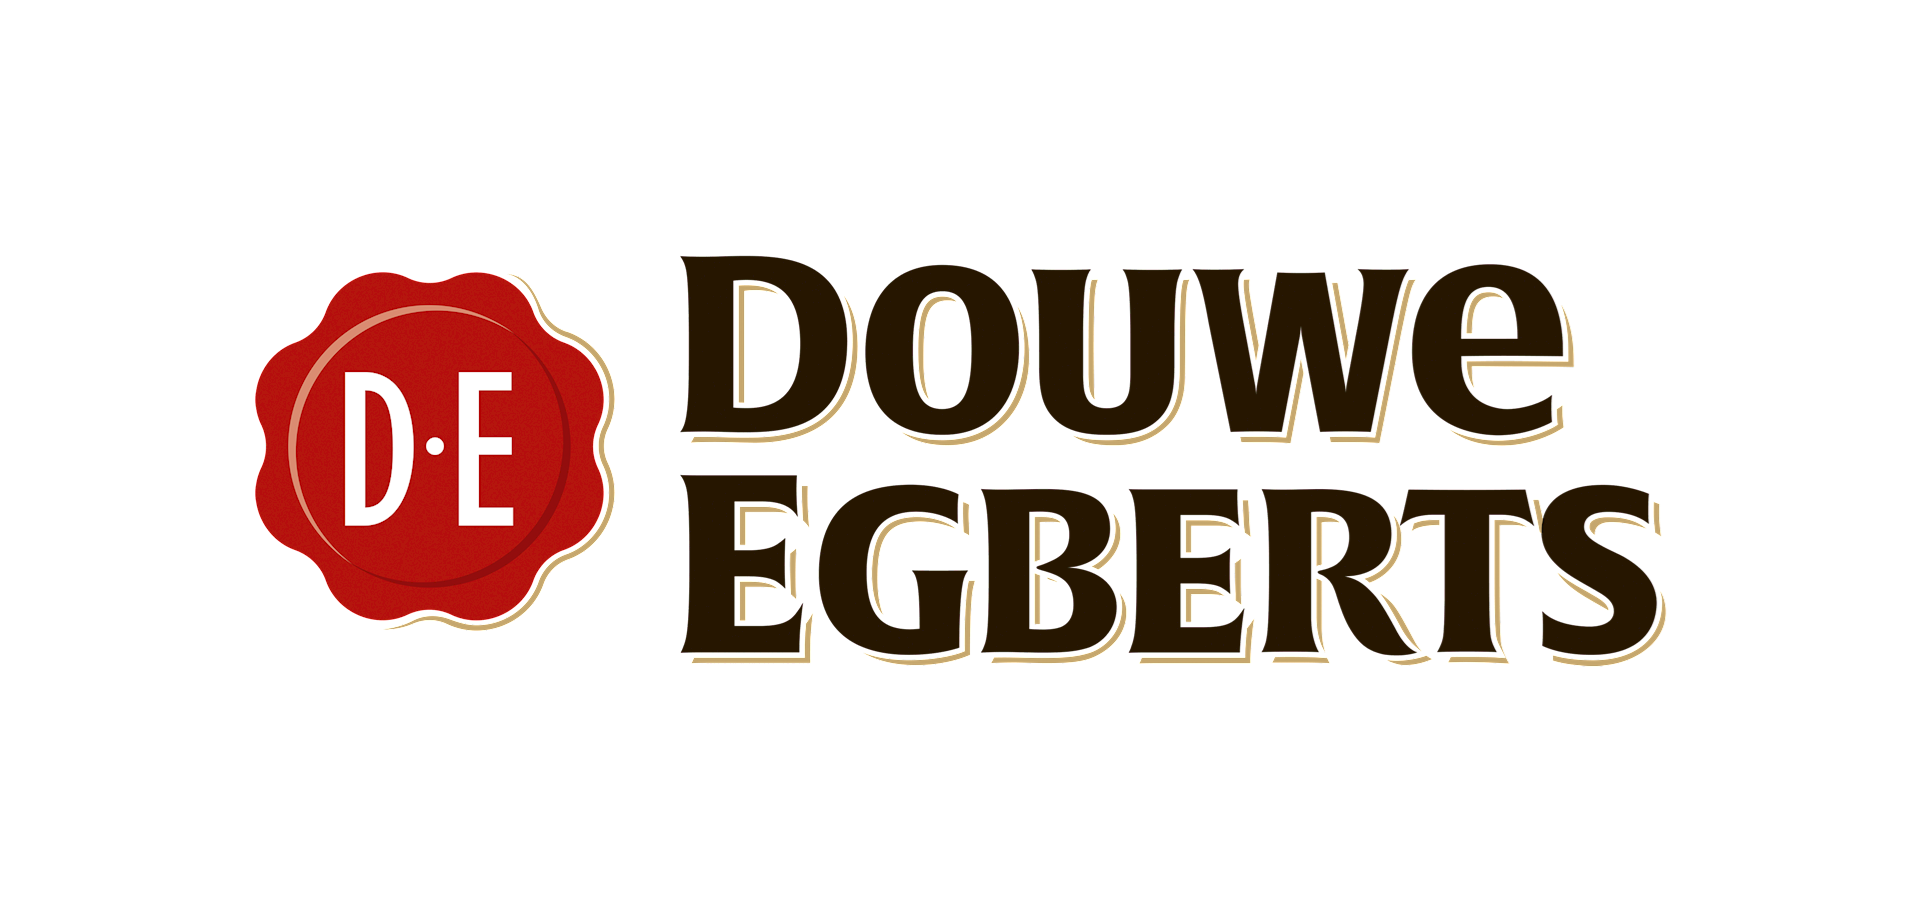 Merkafbeelding DOUWE EGBERTS BUSINESS